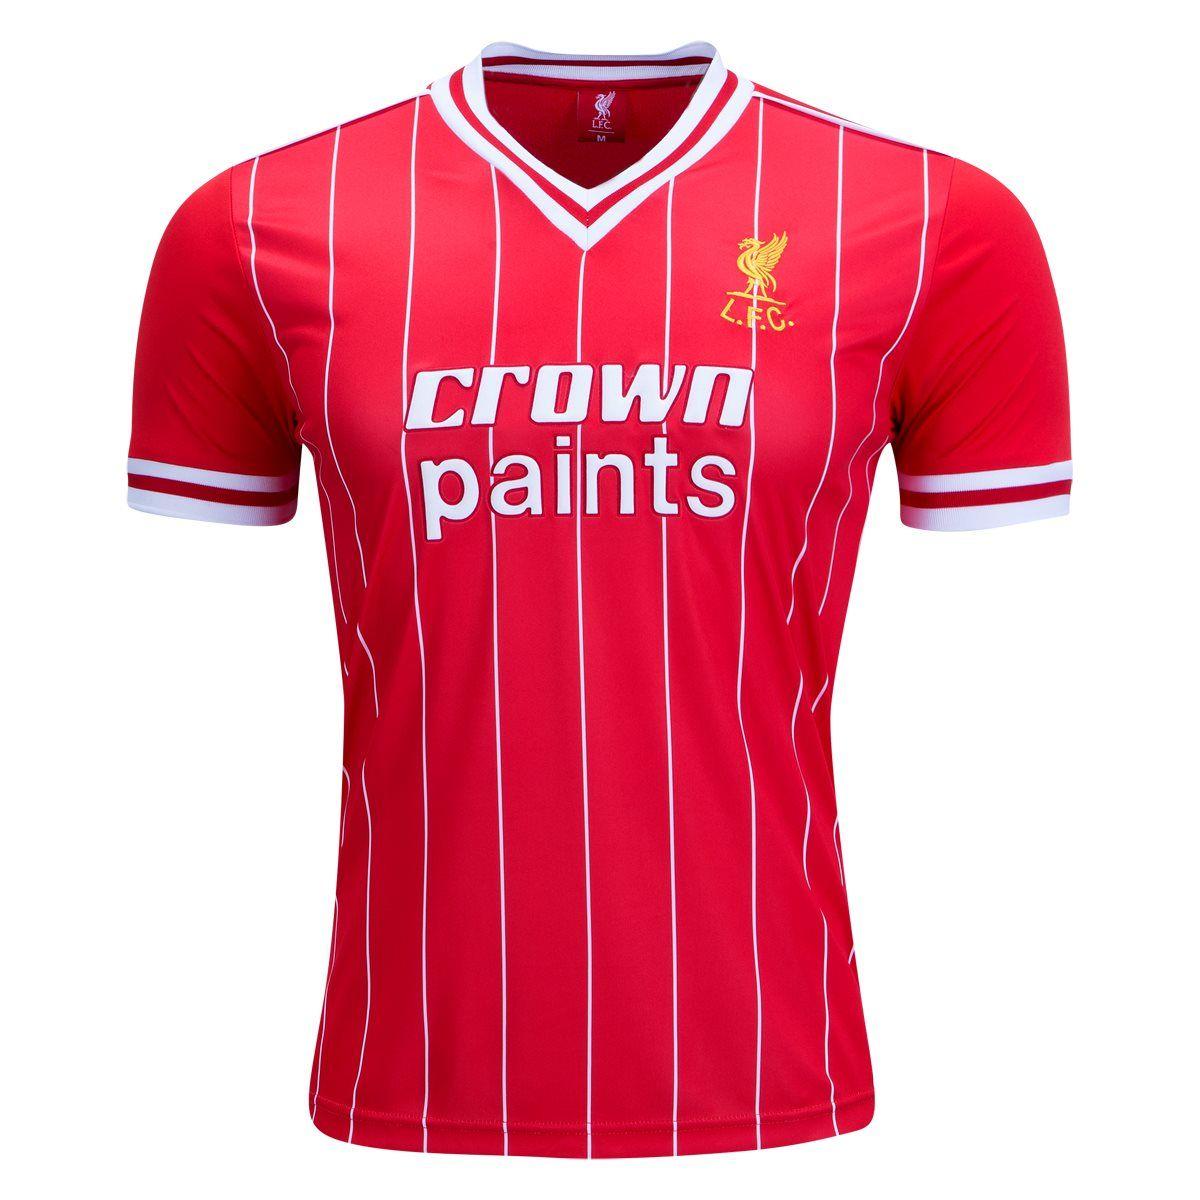 Liverpool 1982 Retro Home Jersey  a32bafad0